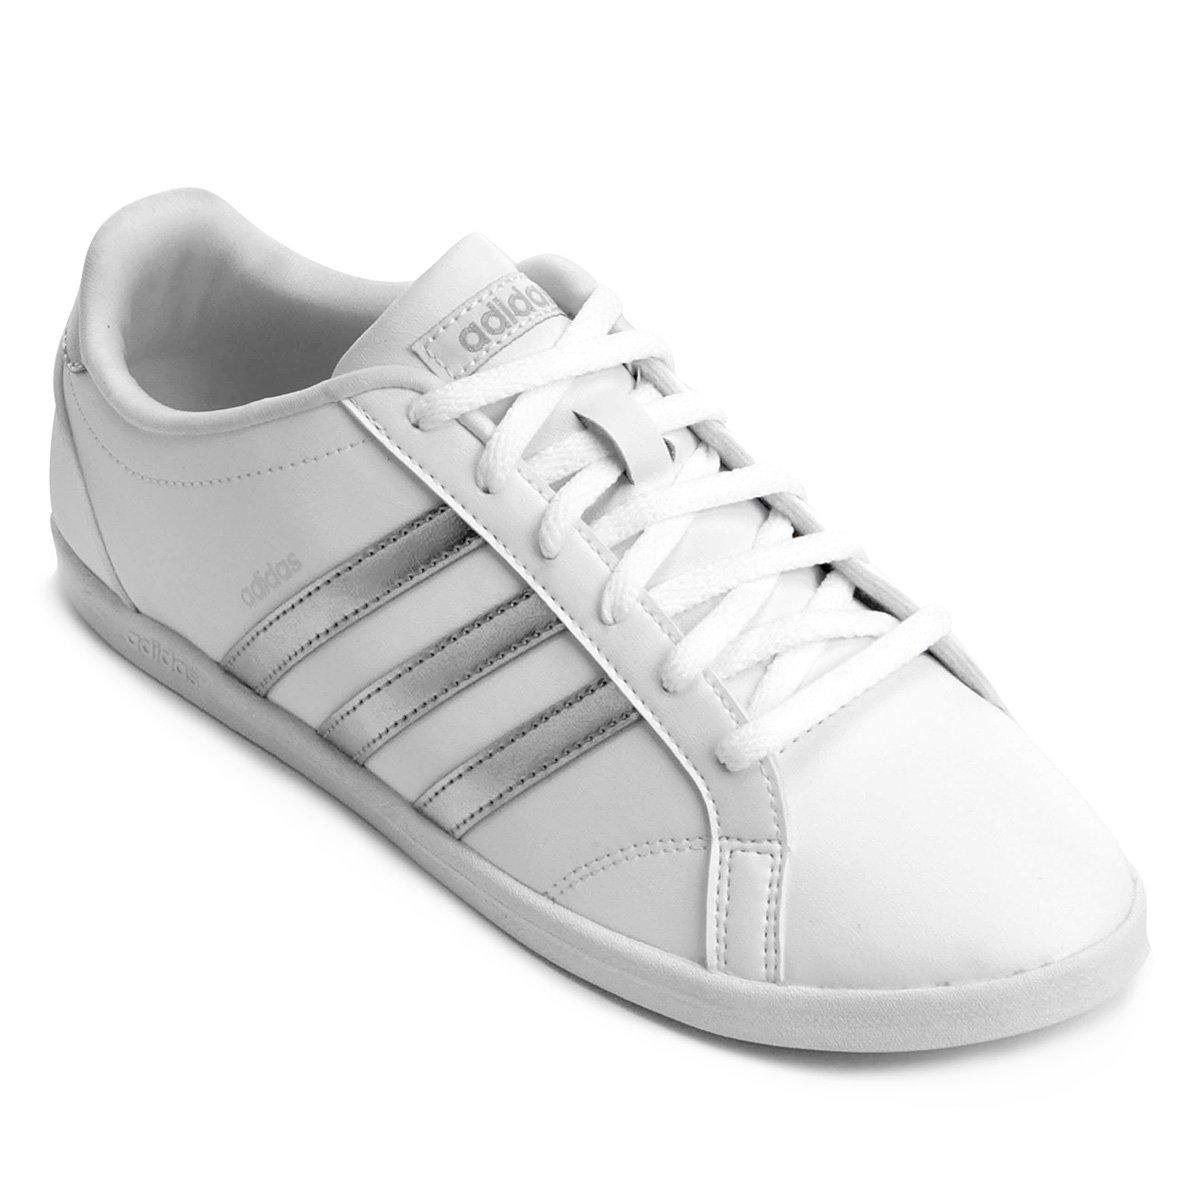 Tênis Adidas Vs Coneo Qt Feminino 4f74386cf5bf1